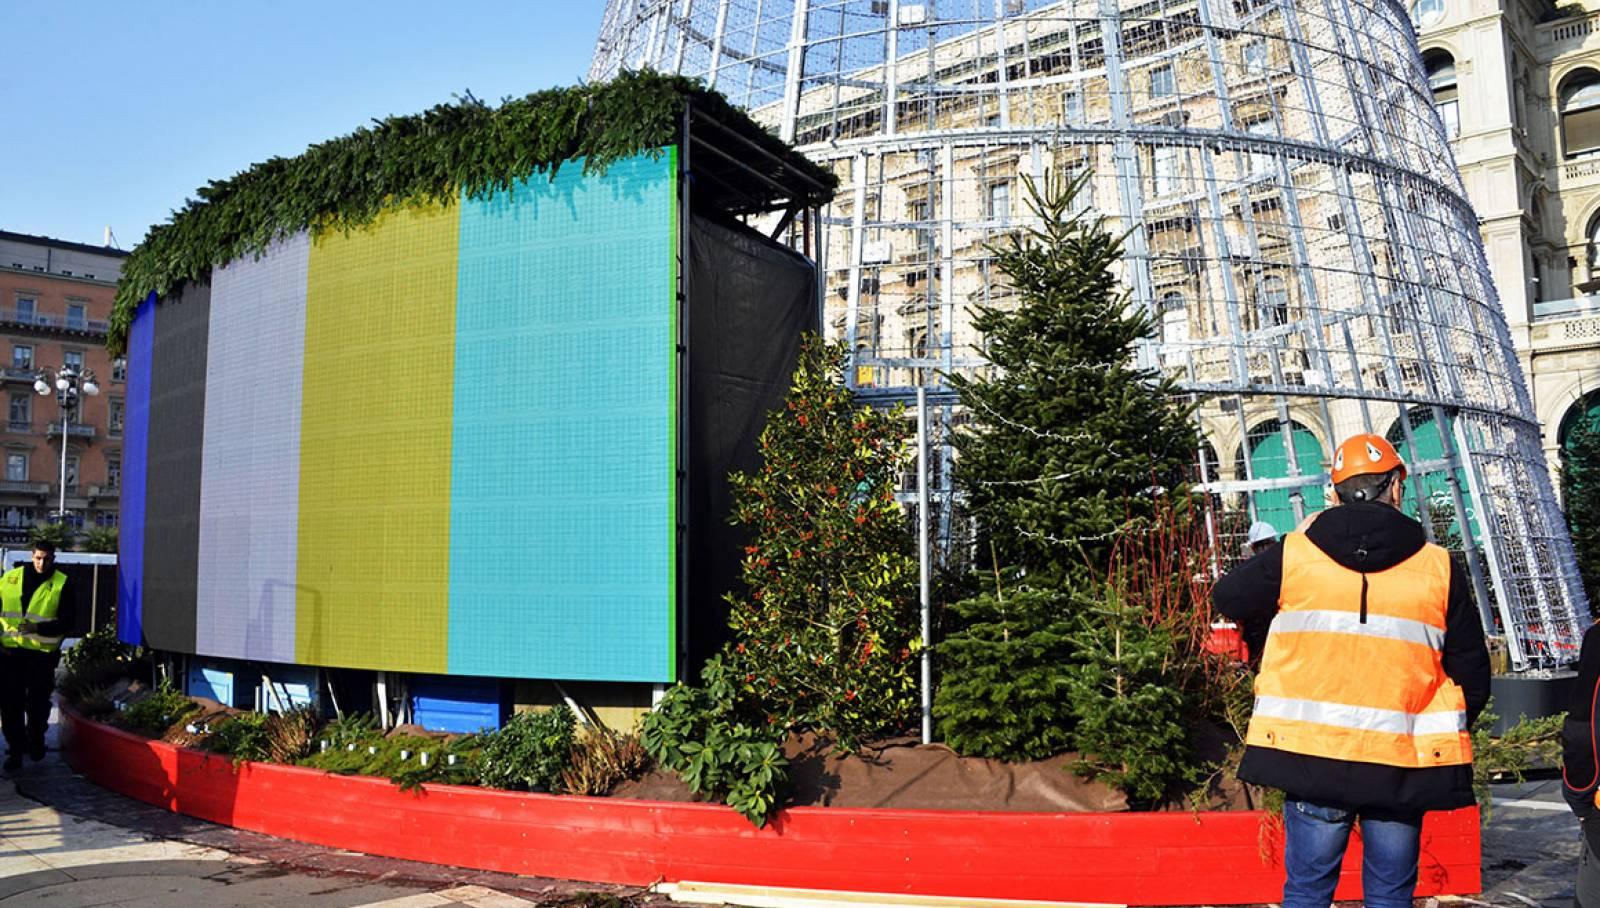 IGPDecaux albero di Natale Esselunga Milano Natale 2019